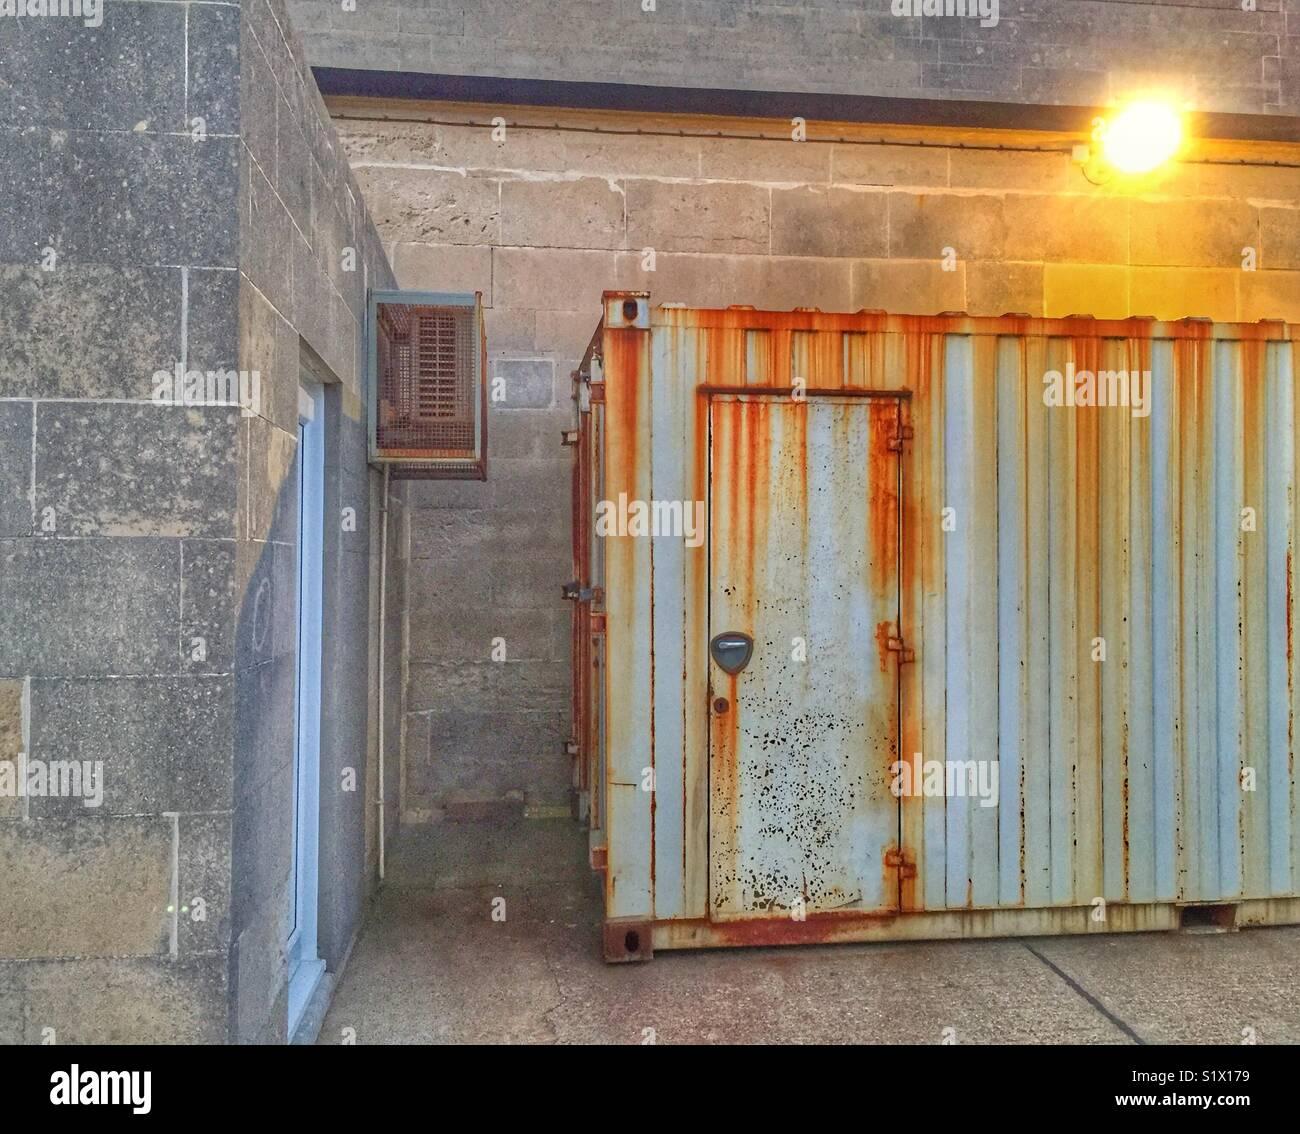 Industrial Metal Storage Shed - Stock Image